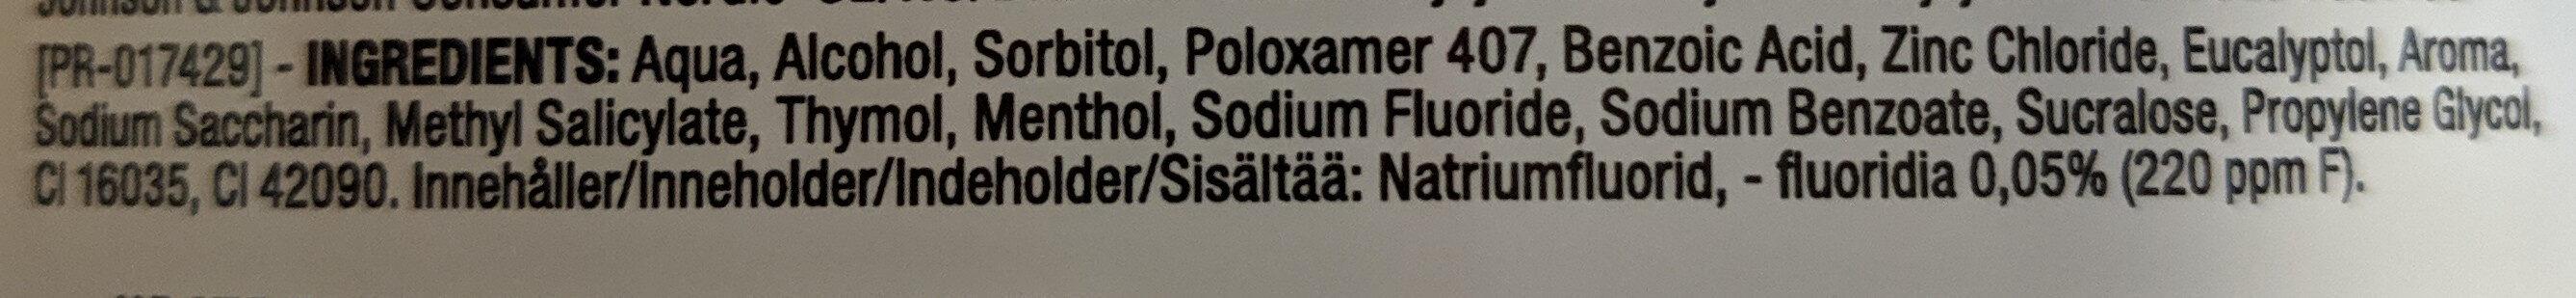 Listerine Total Care Clean Mint - Ingredients